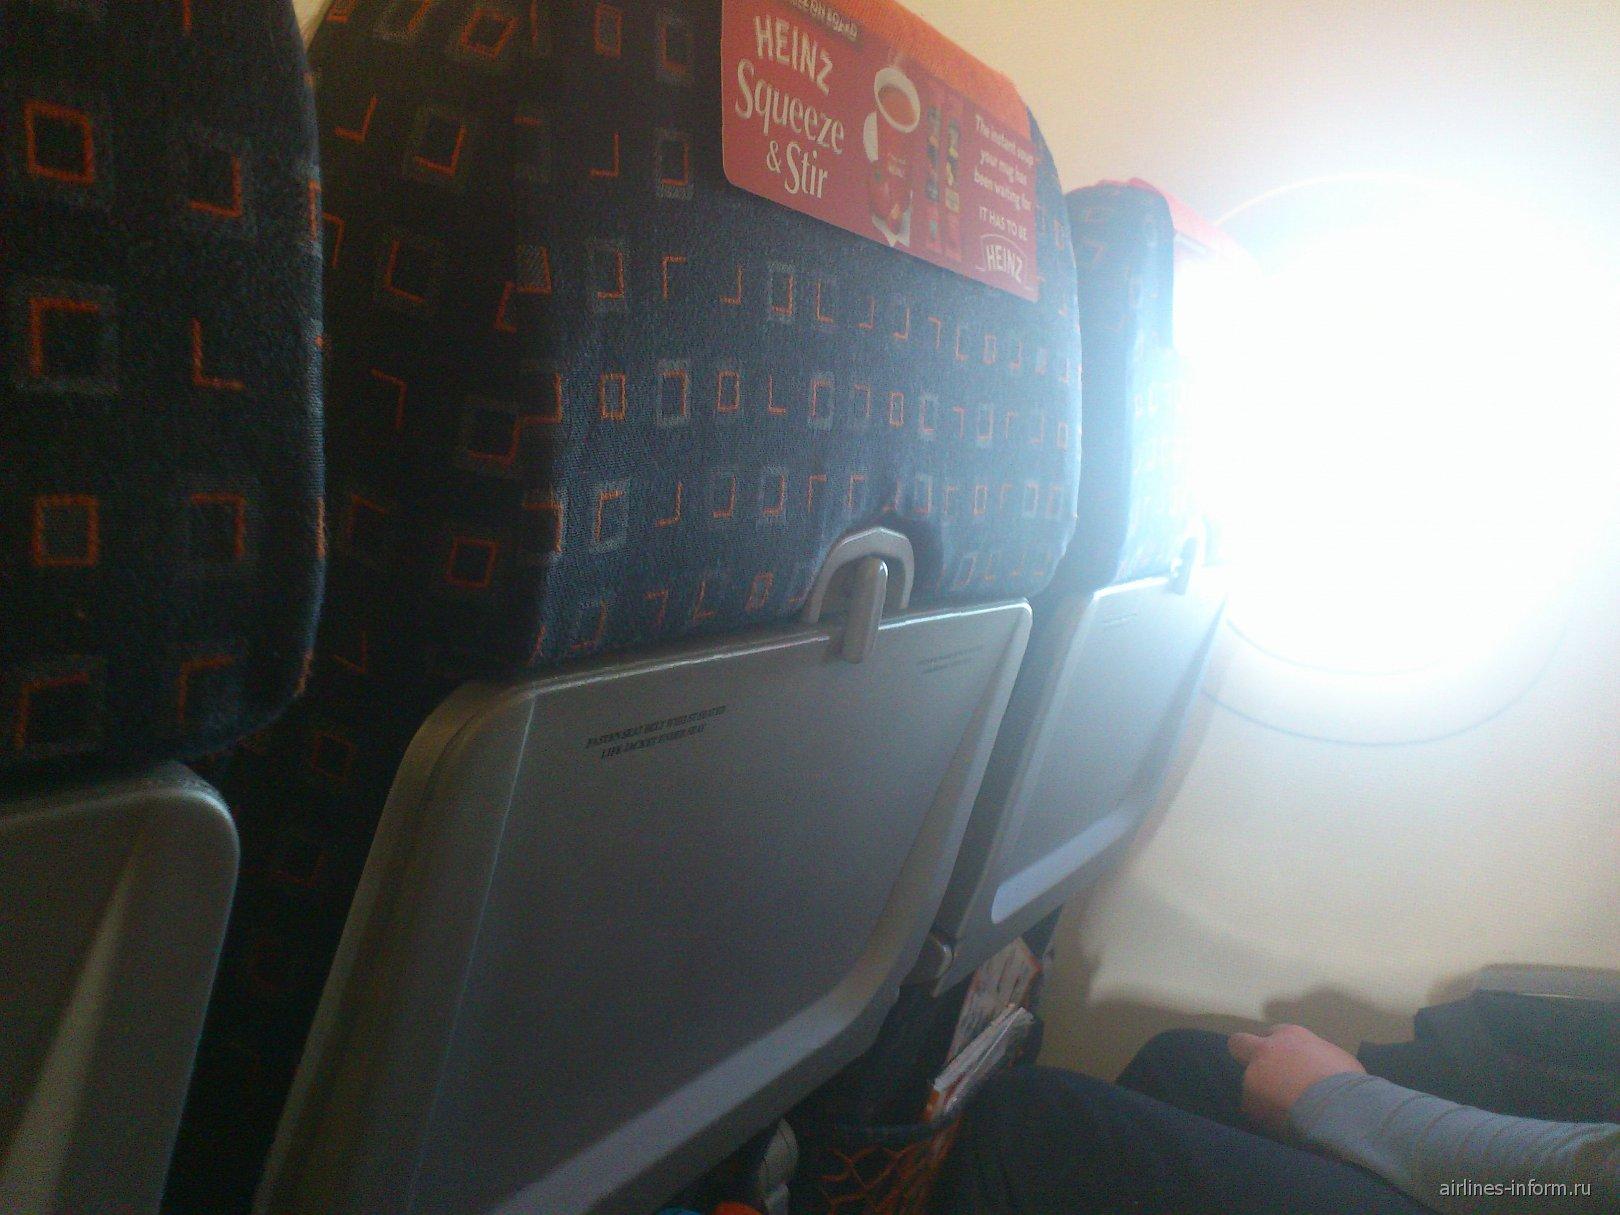 Салон самолета Airbus A320 авиакомпании easyJet